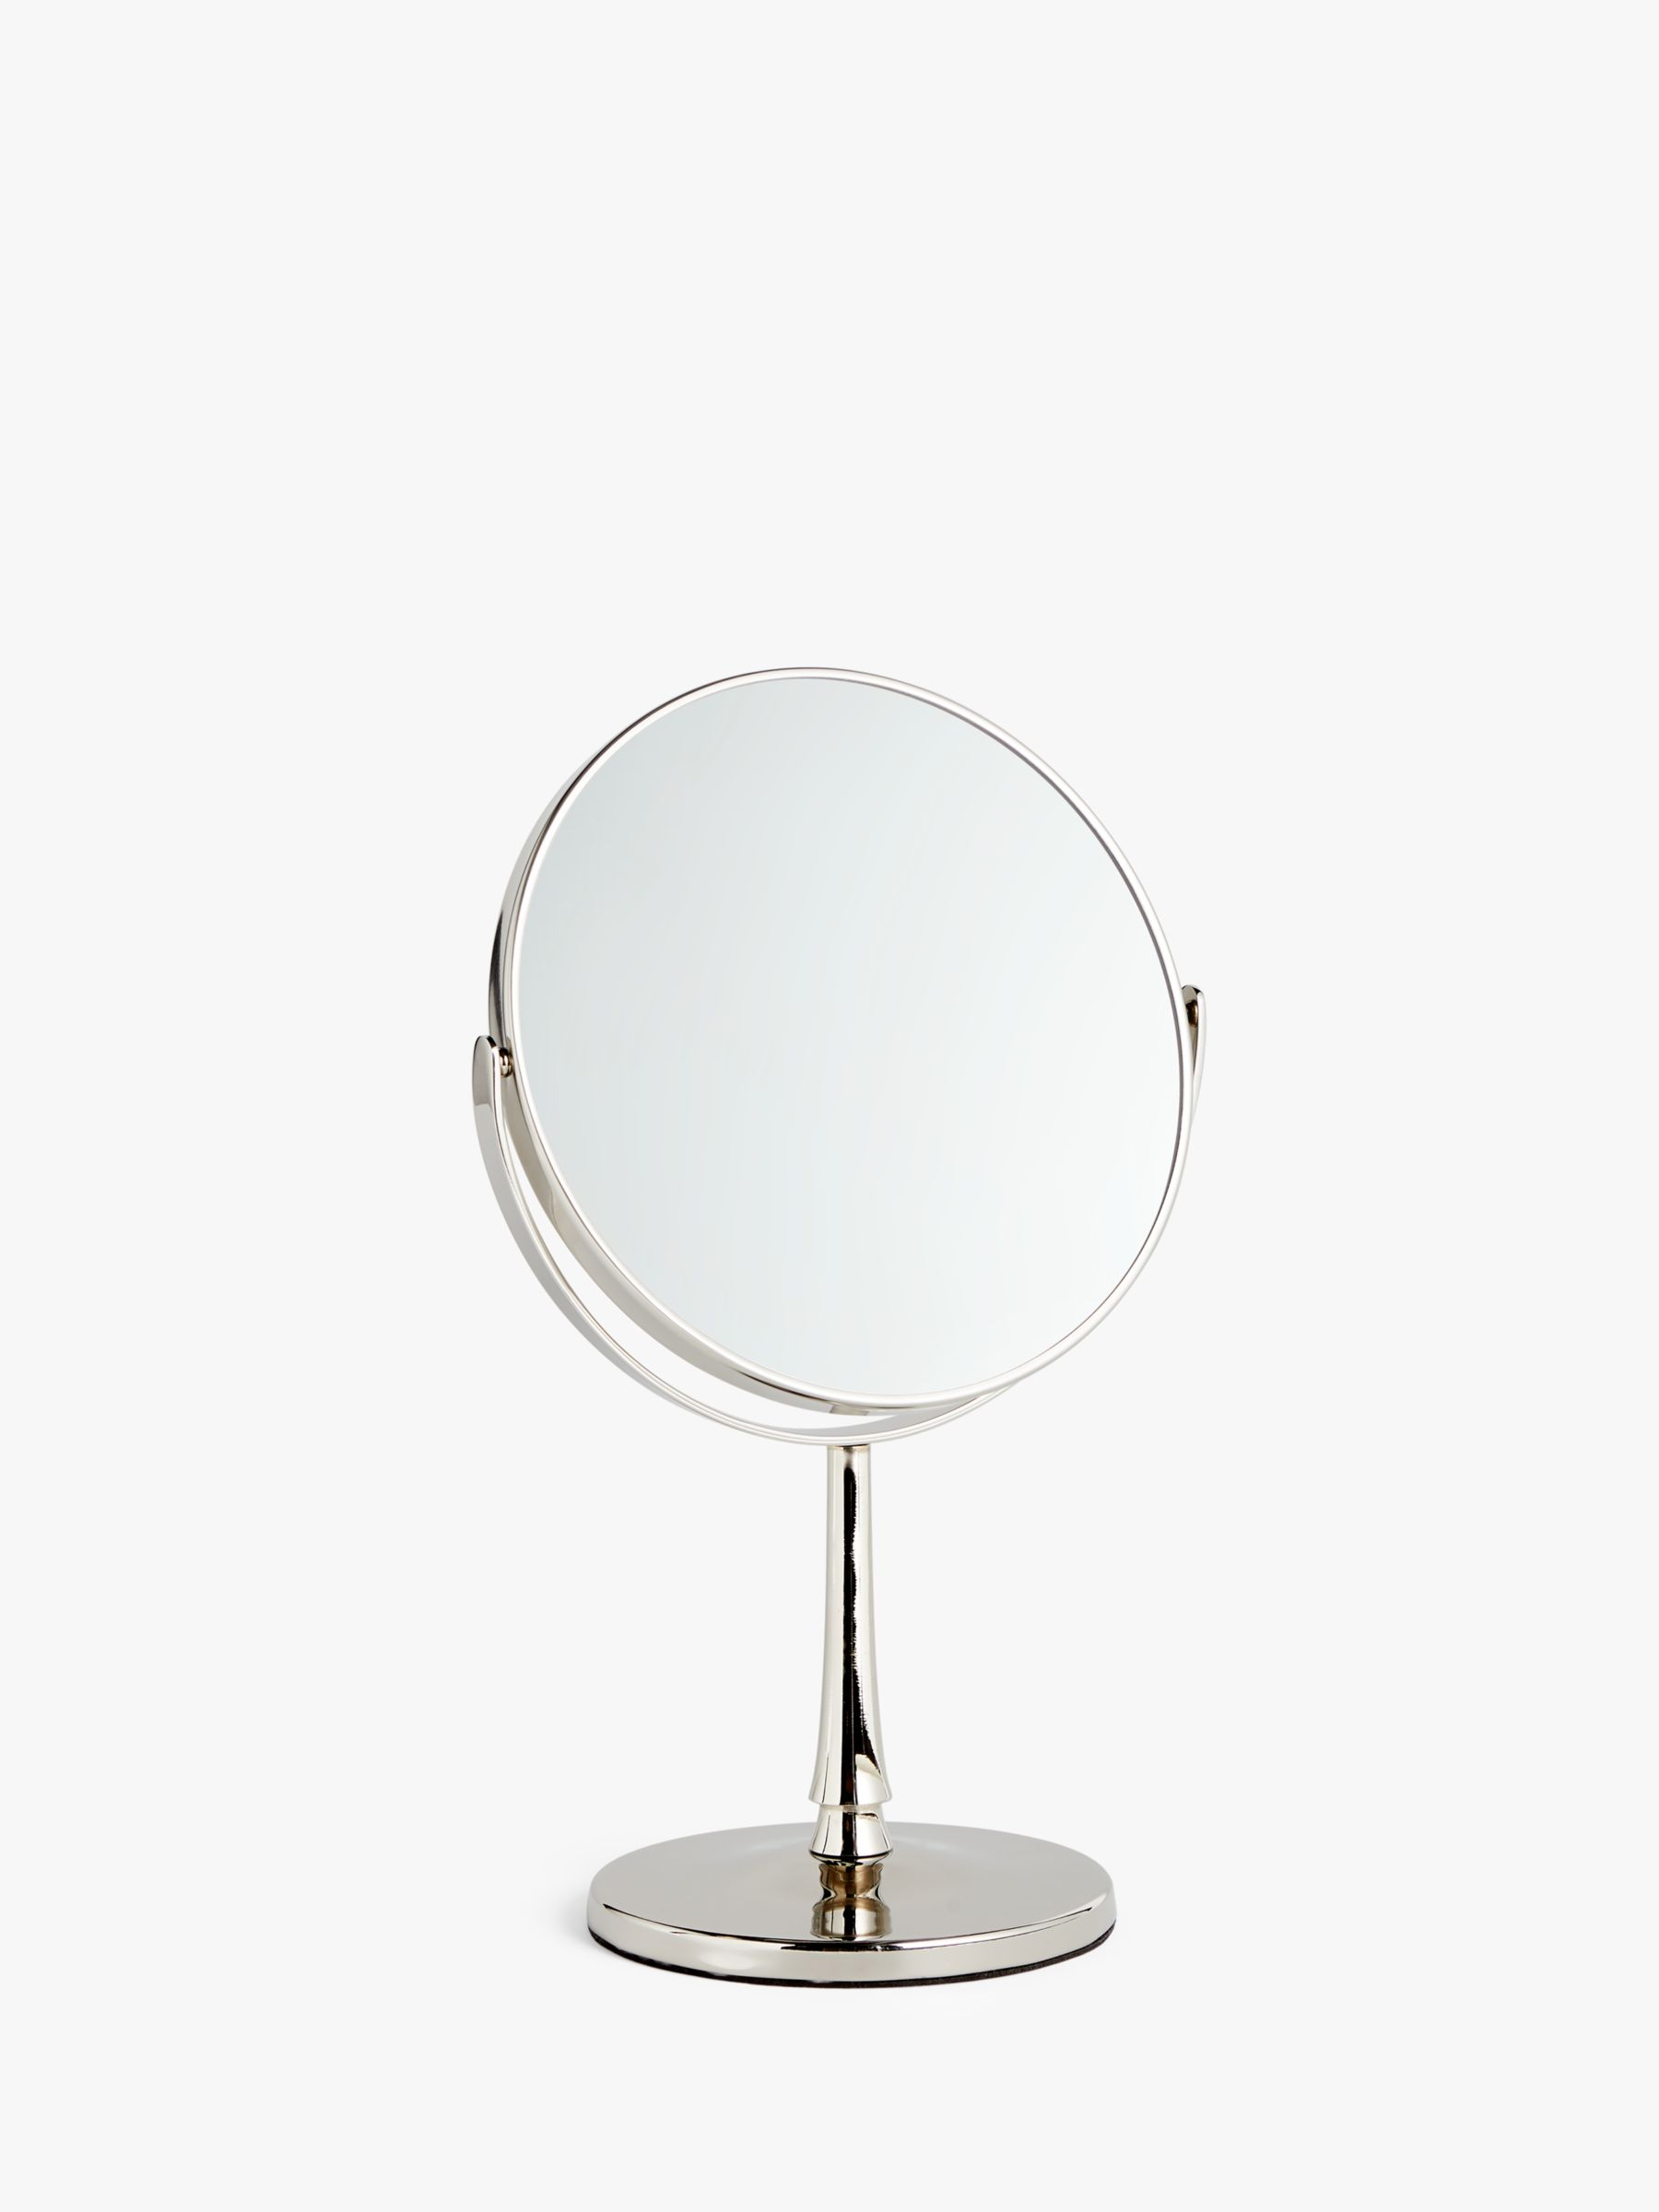 John Lewis Partners Classic And Decorative Pedestal Mirror